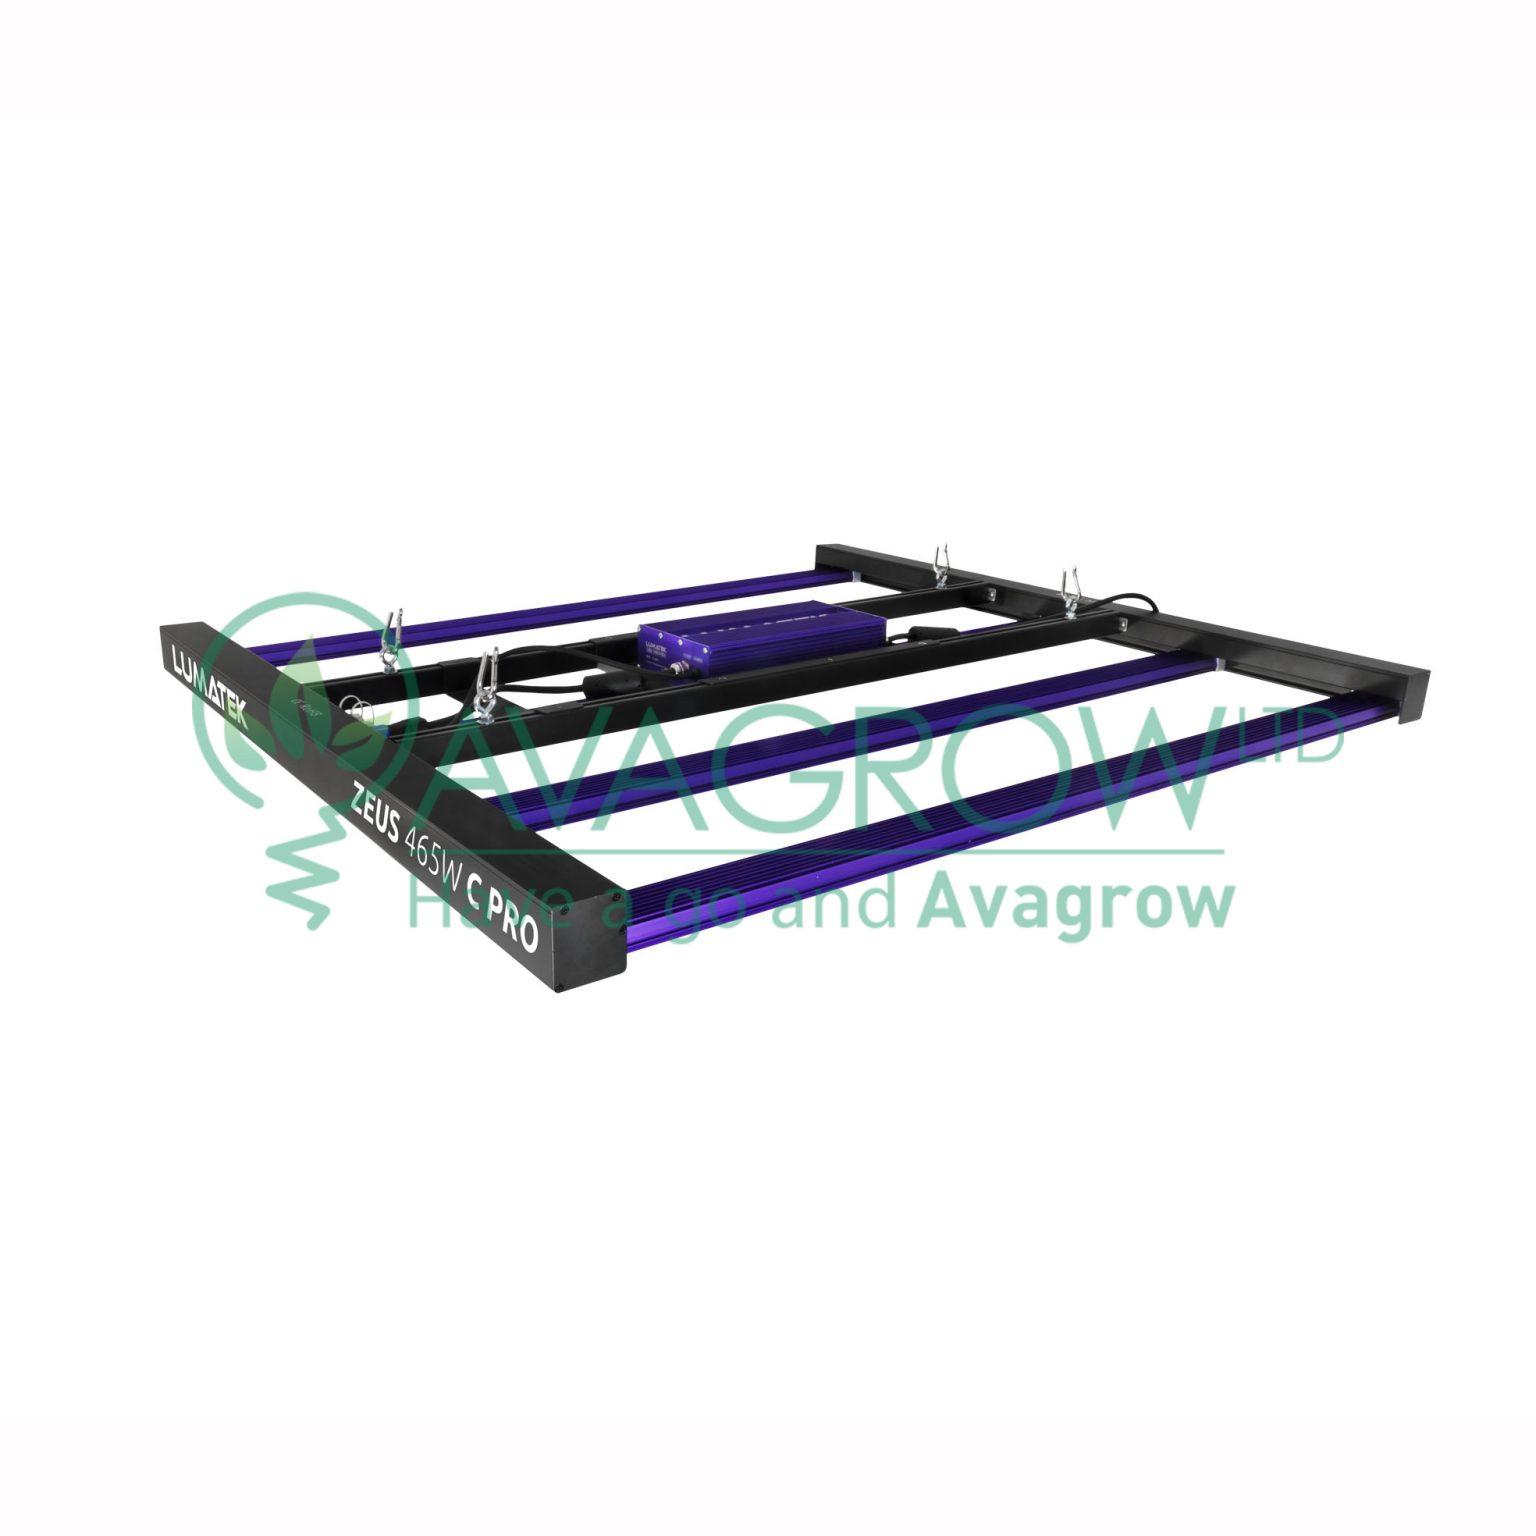 Lumatek Xeus Pro 465w Compact LED Fixture